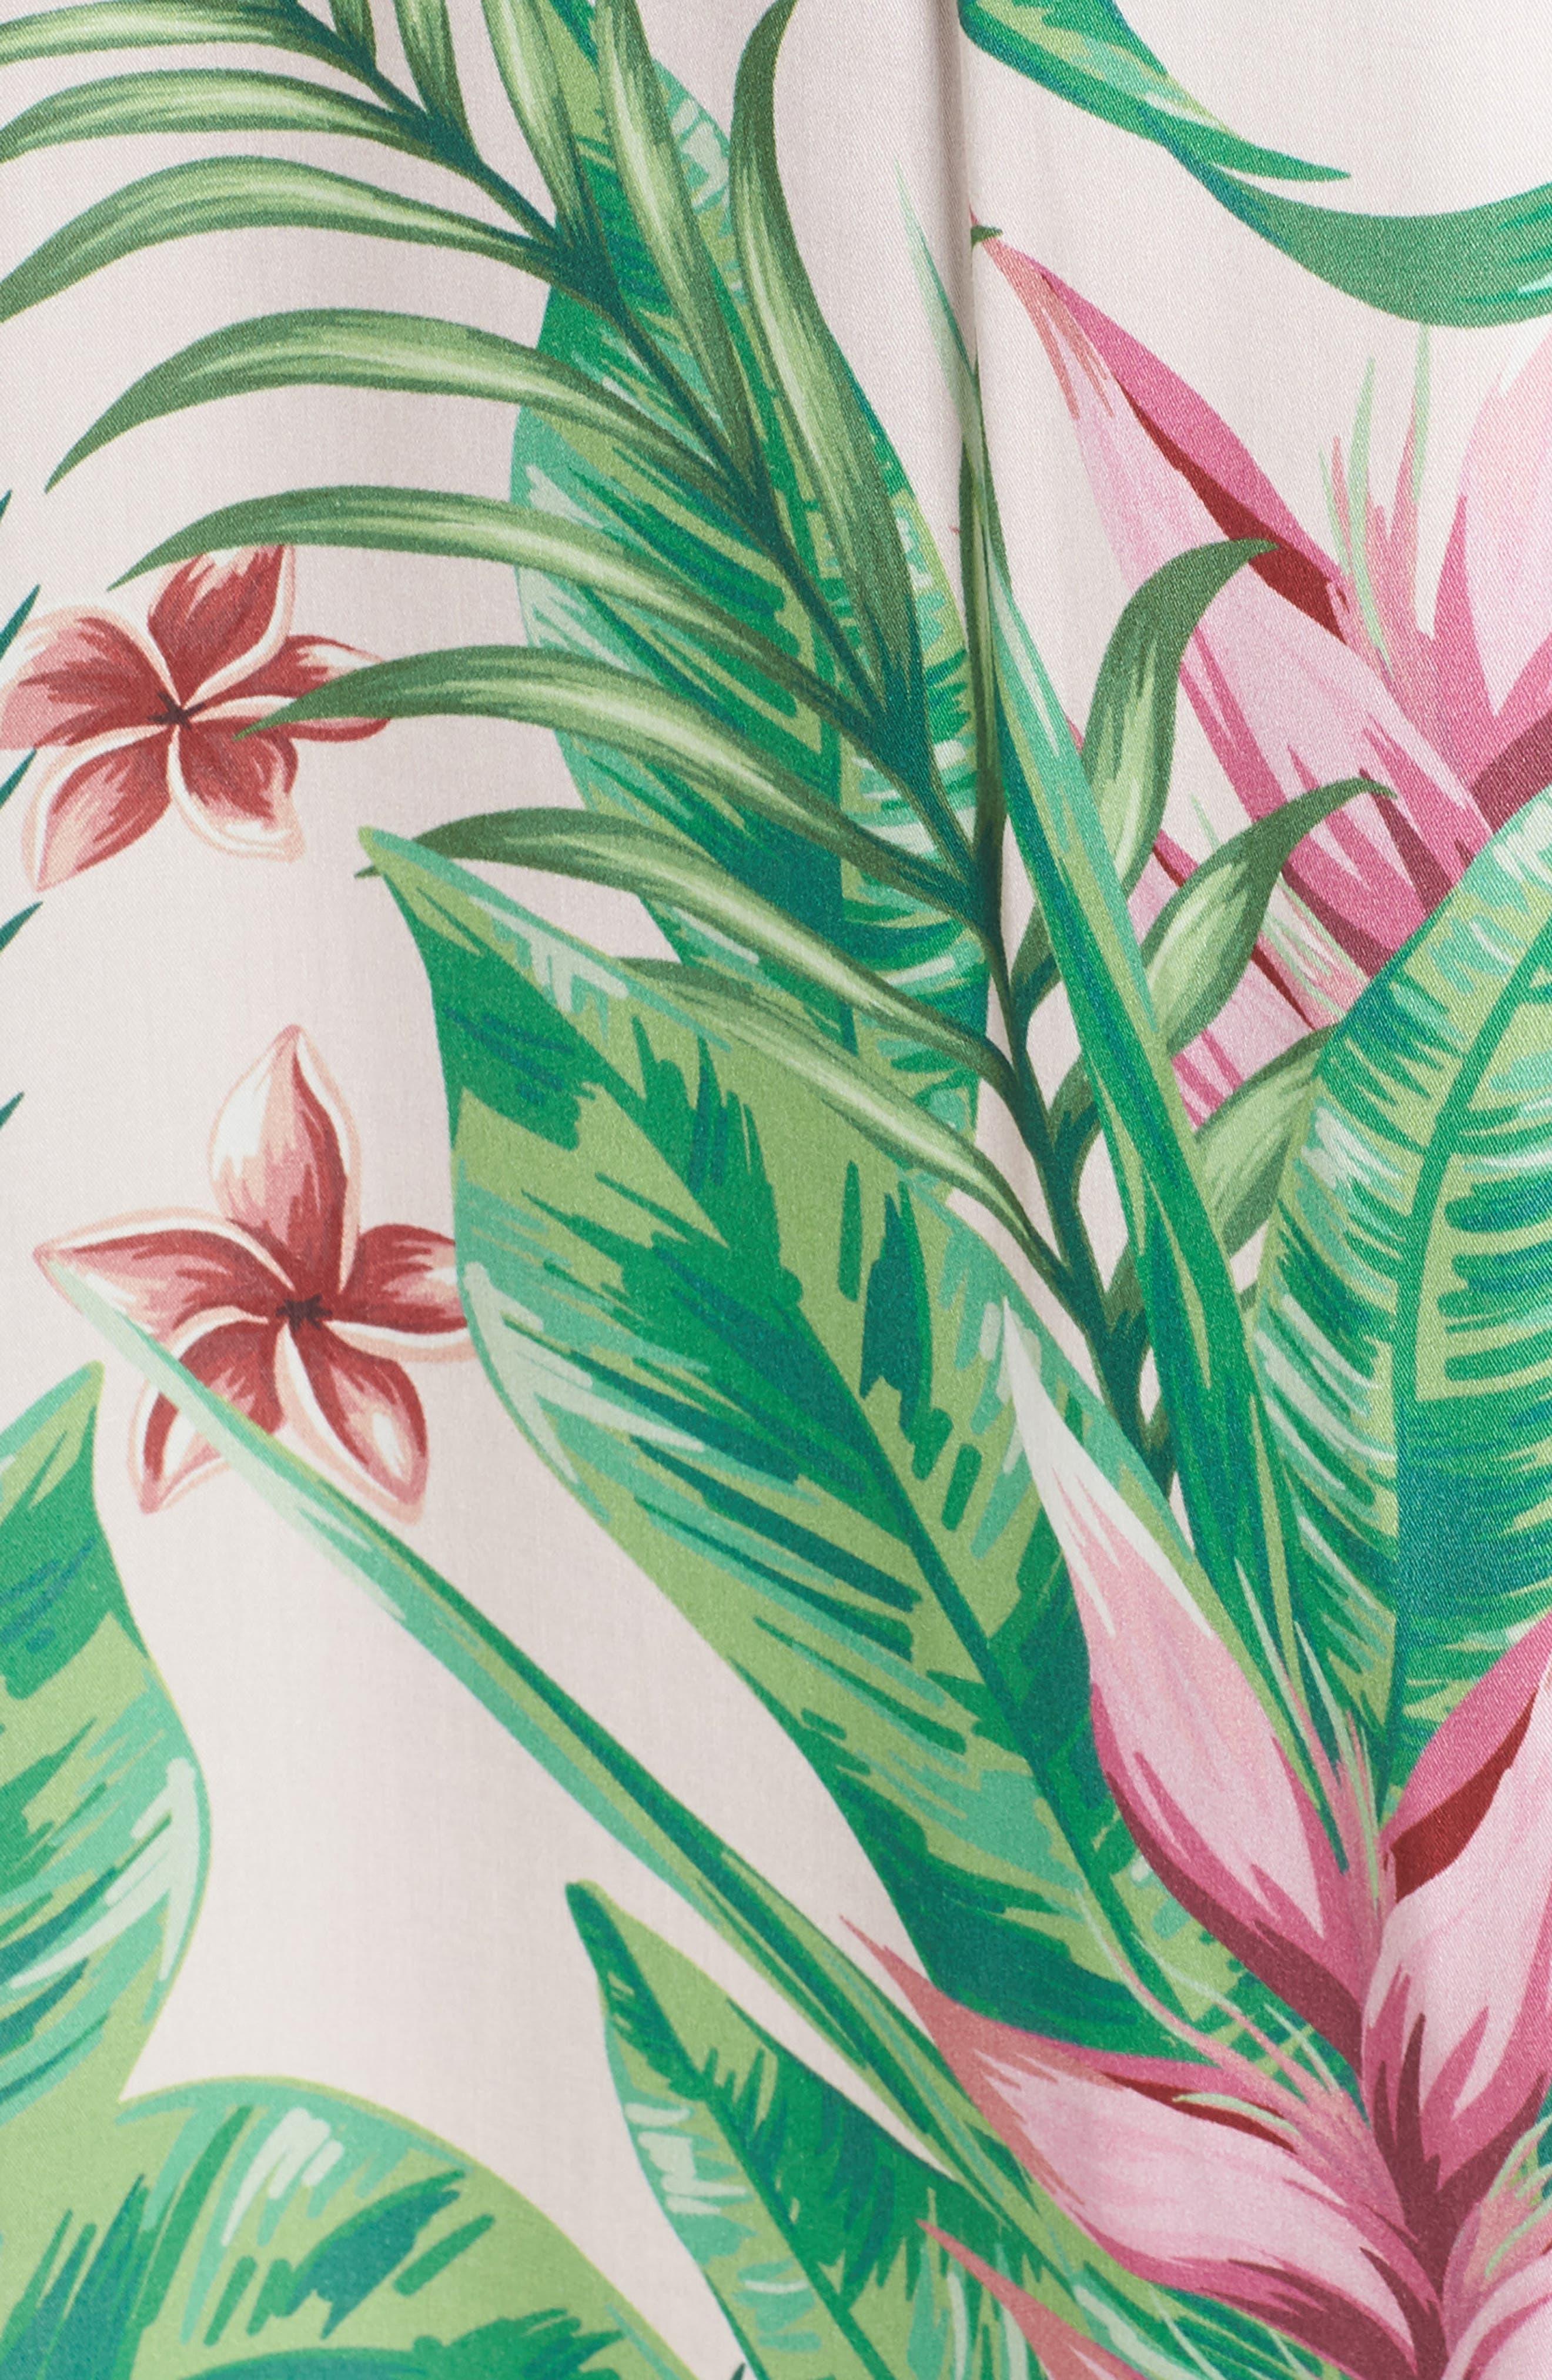 Floral Print Robe,                             Alternate thumbnail 5, color,                             Avalon Palm